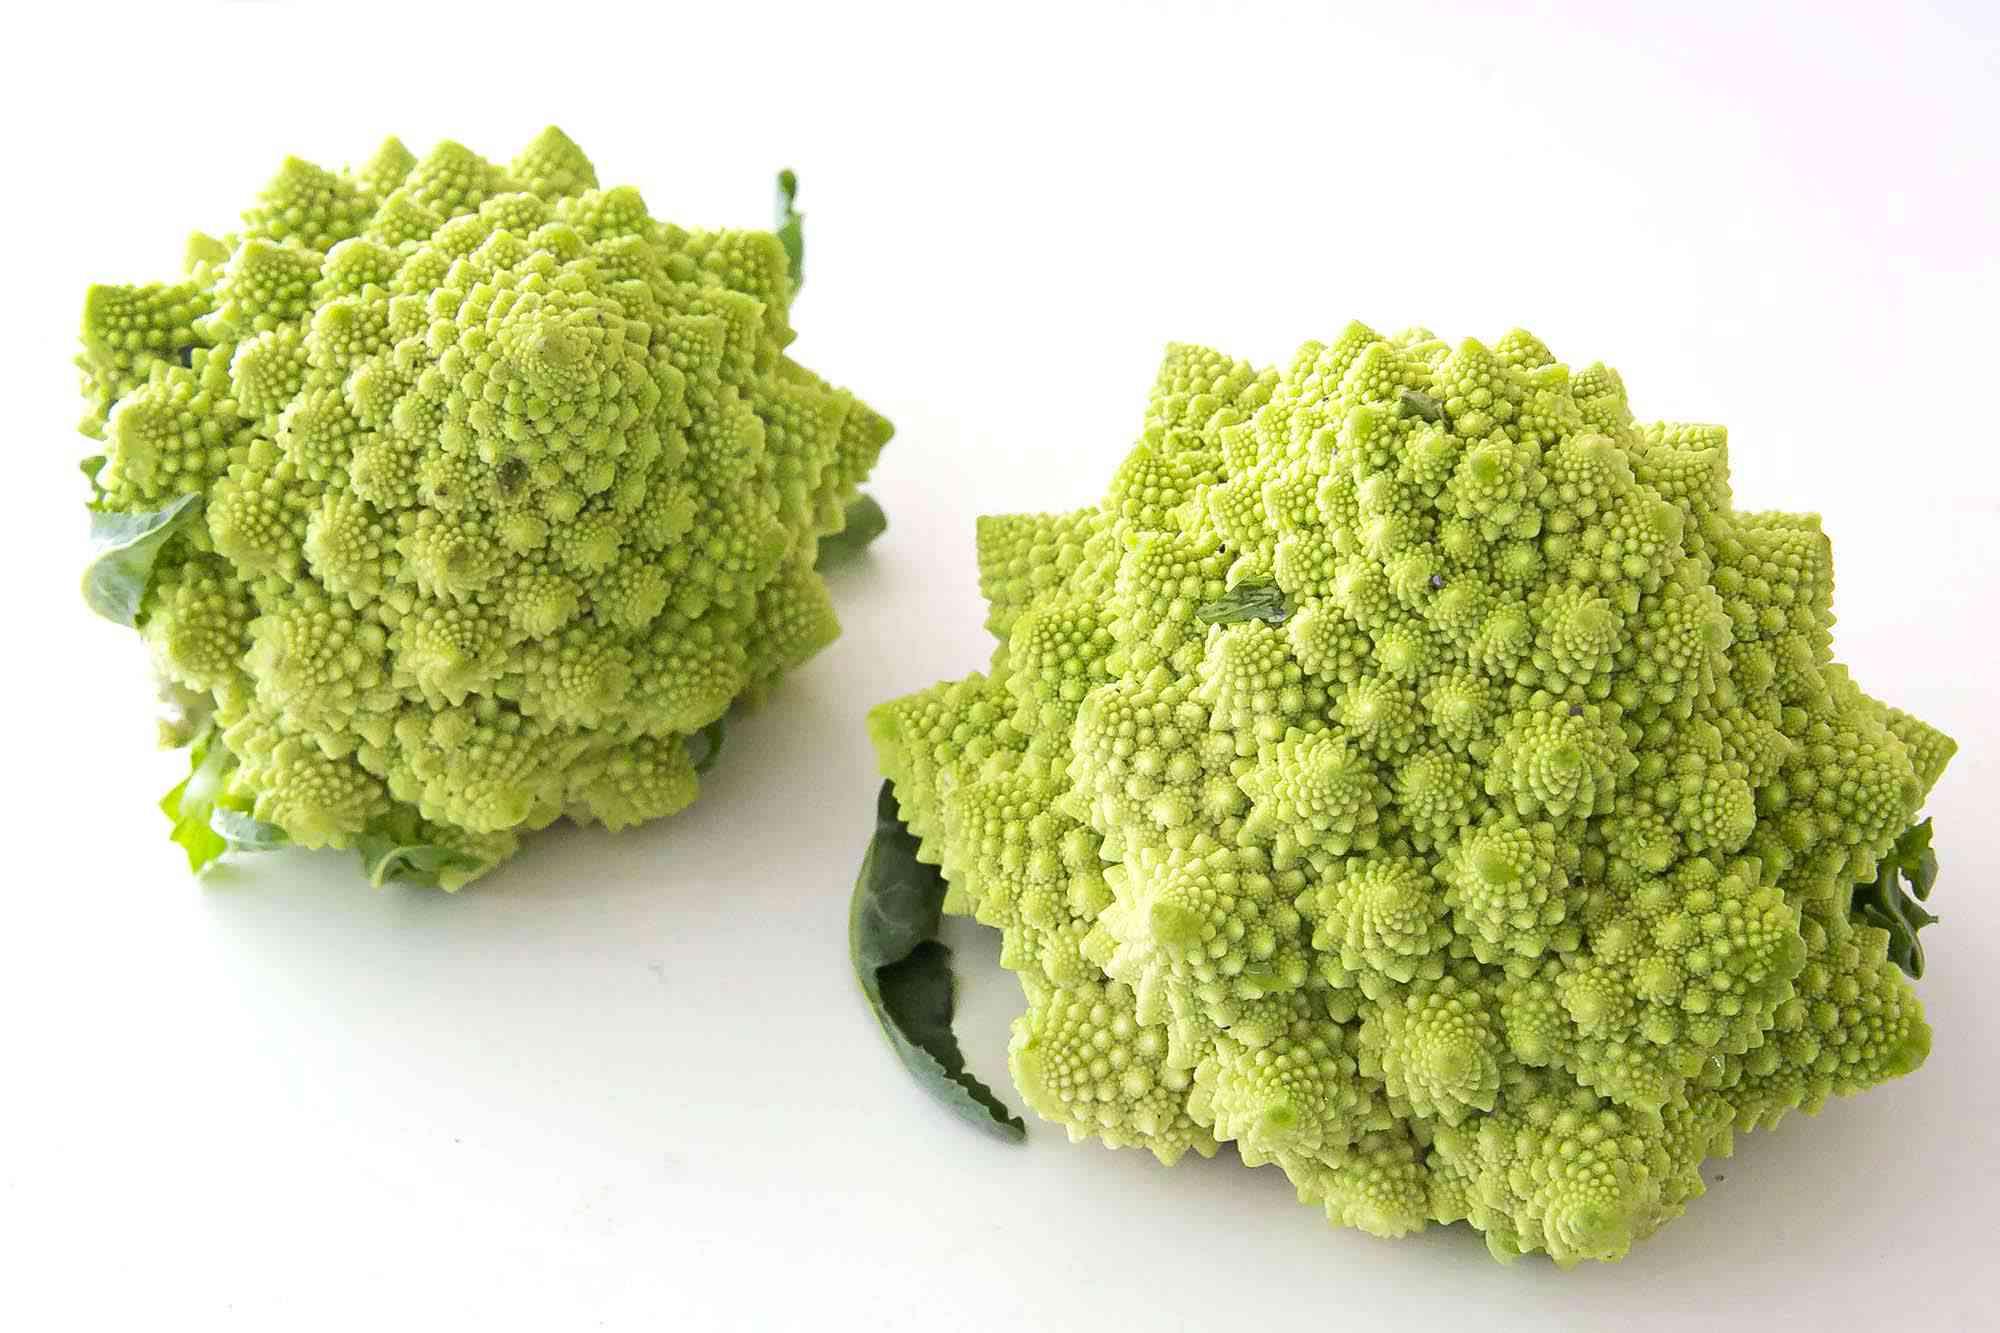 Romanesco cauliflower on a countertop